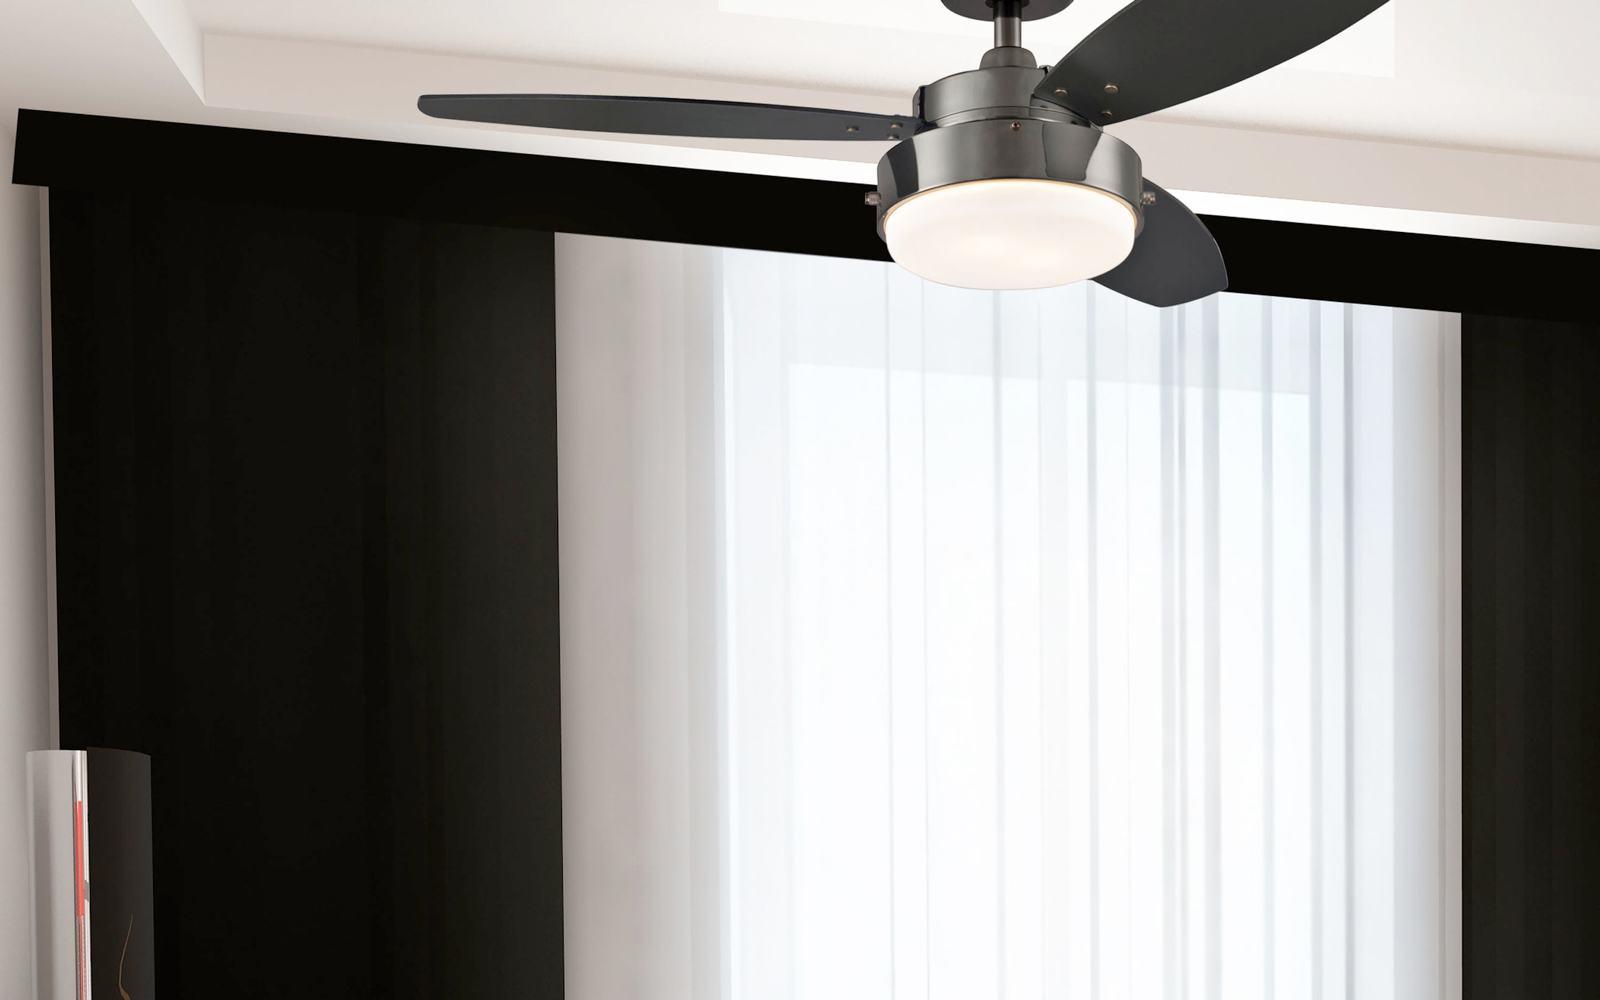 Sea Gull Lighting Windgate 9 In W 3 Light Brushed Nickel: Westinghouse 7876400 Alloy Reversible Three-Blade Indoor